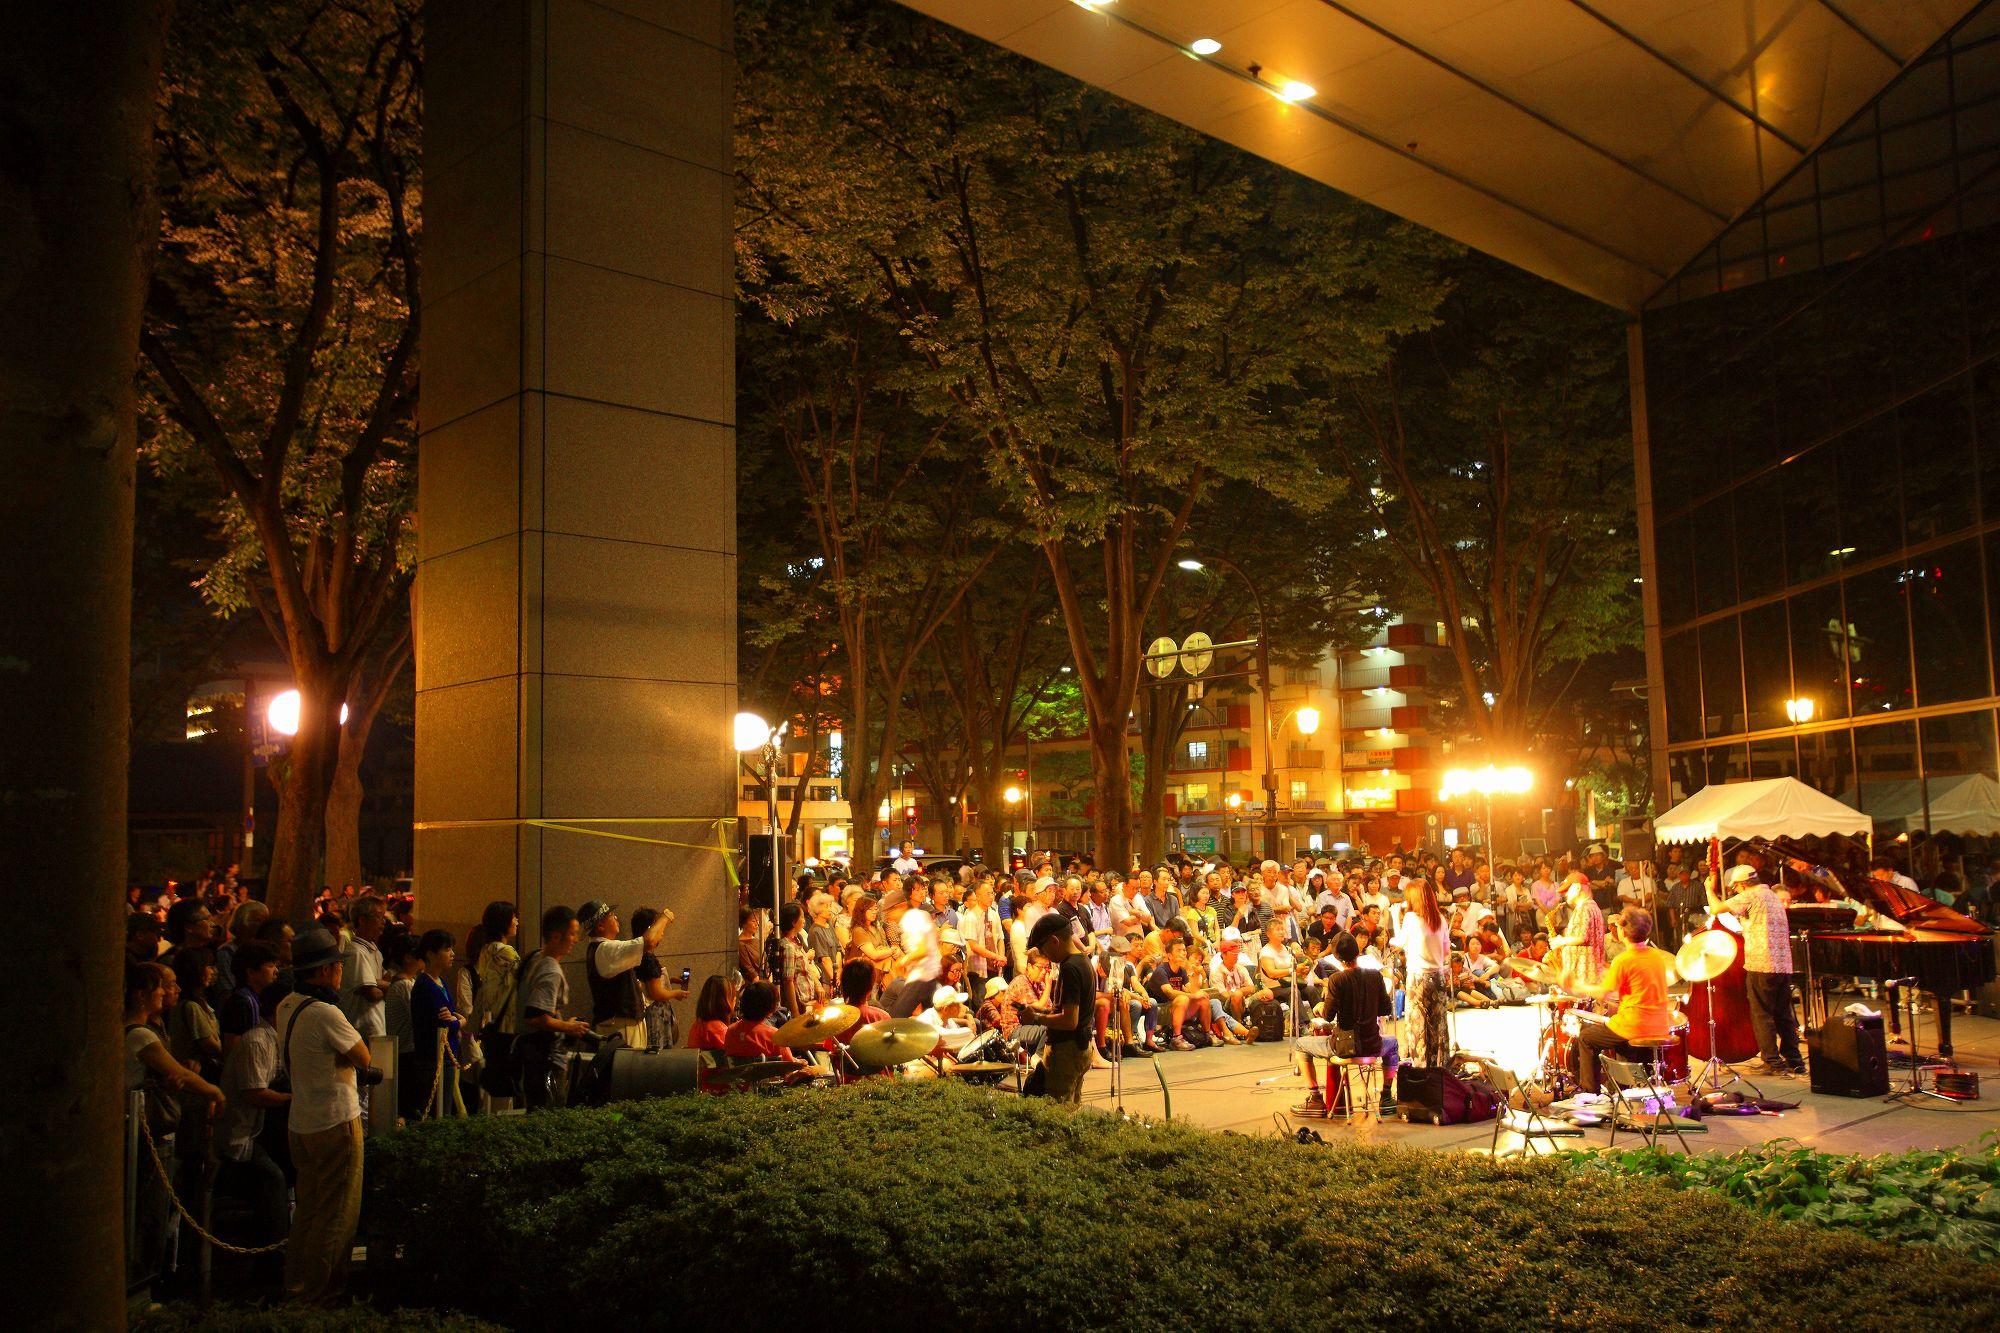 No.010436 定禅寺ストリートジャズフェスティバル